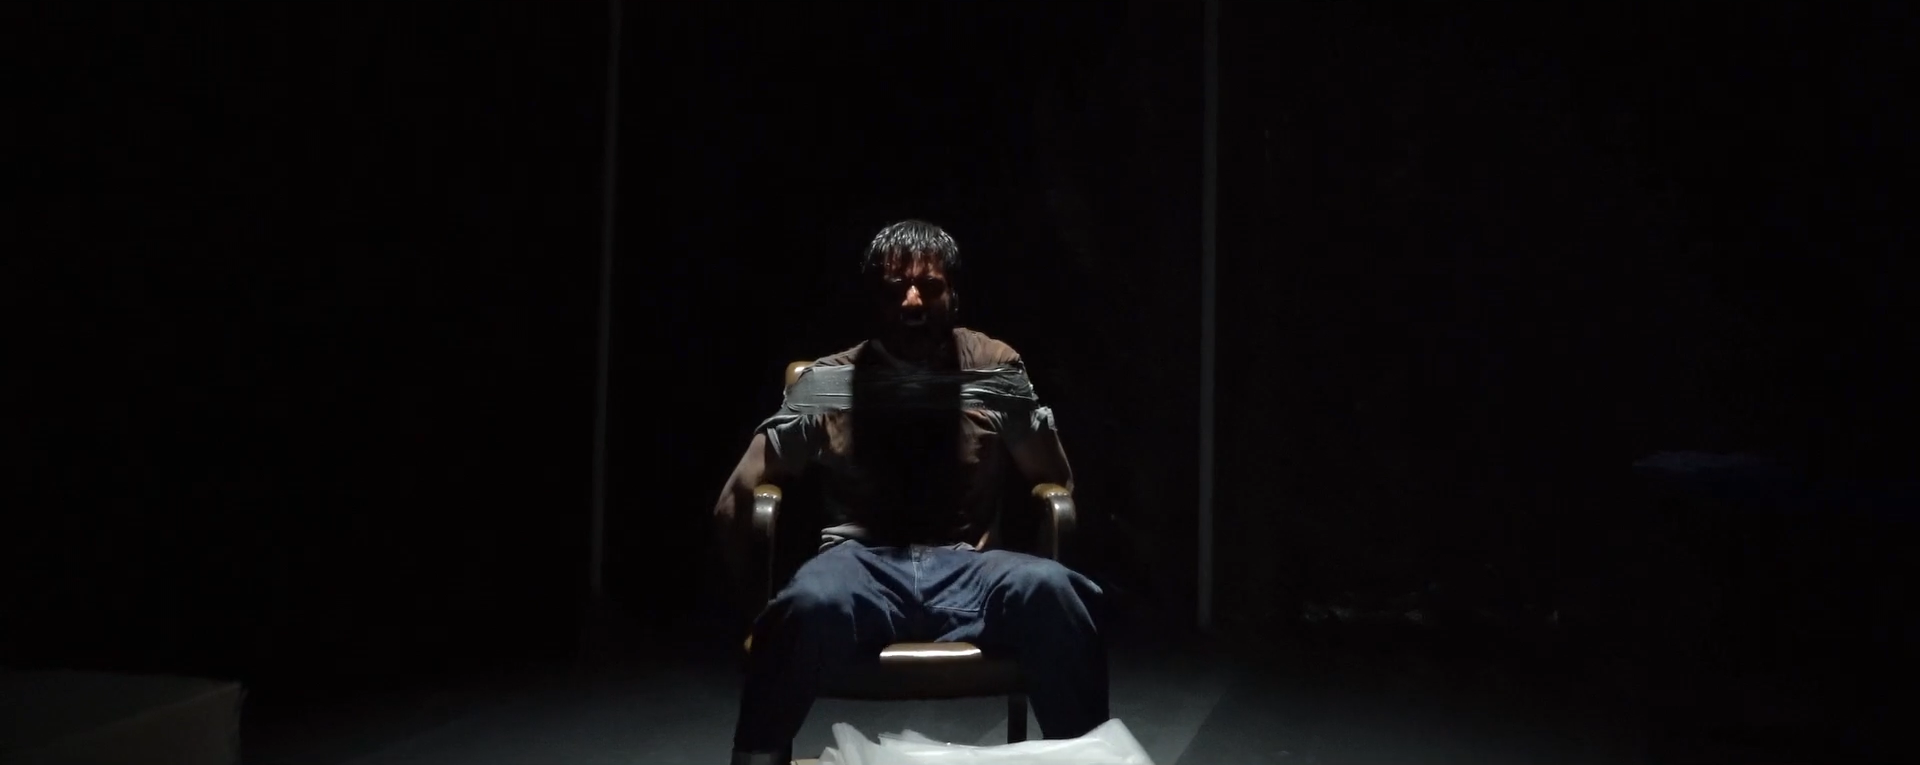 'Shot in the Dark' review: Dir. Keene McRae [Grimmfest 2021]